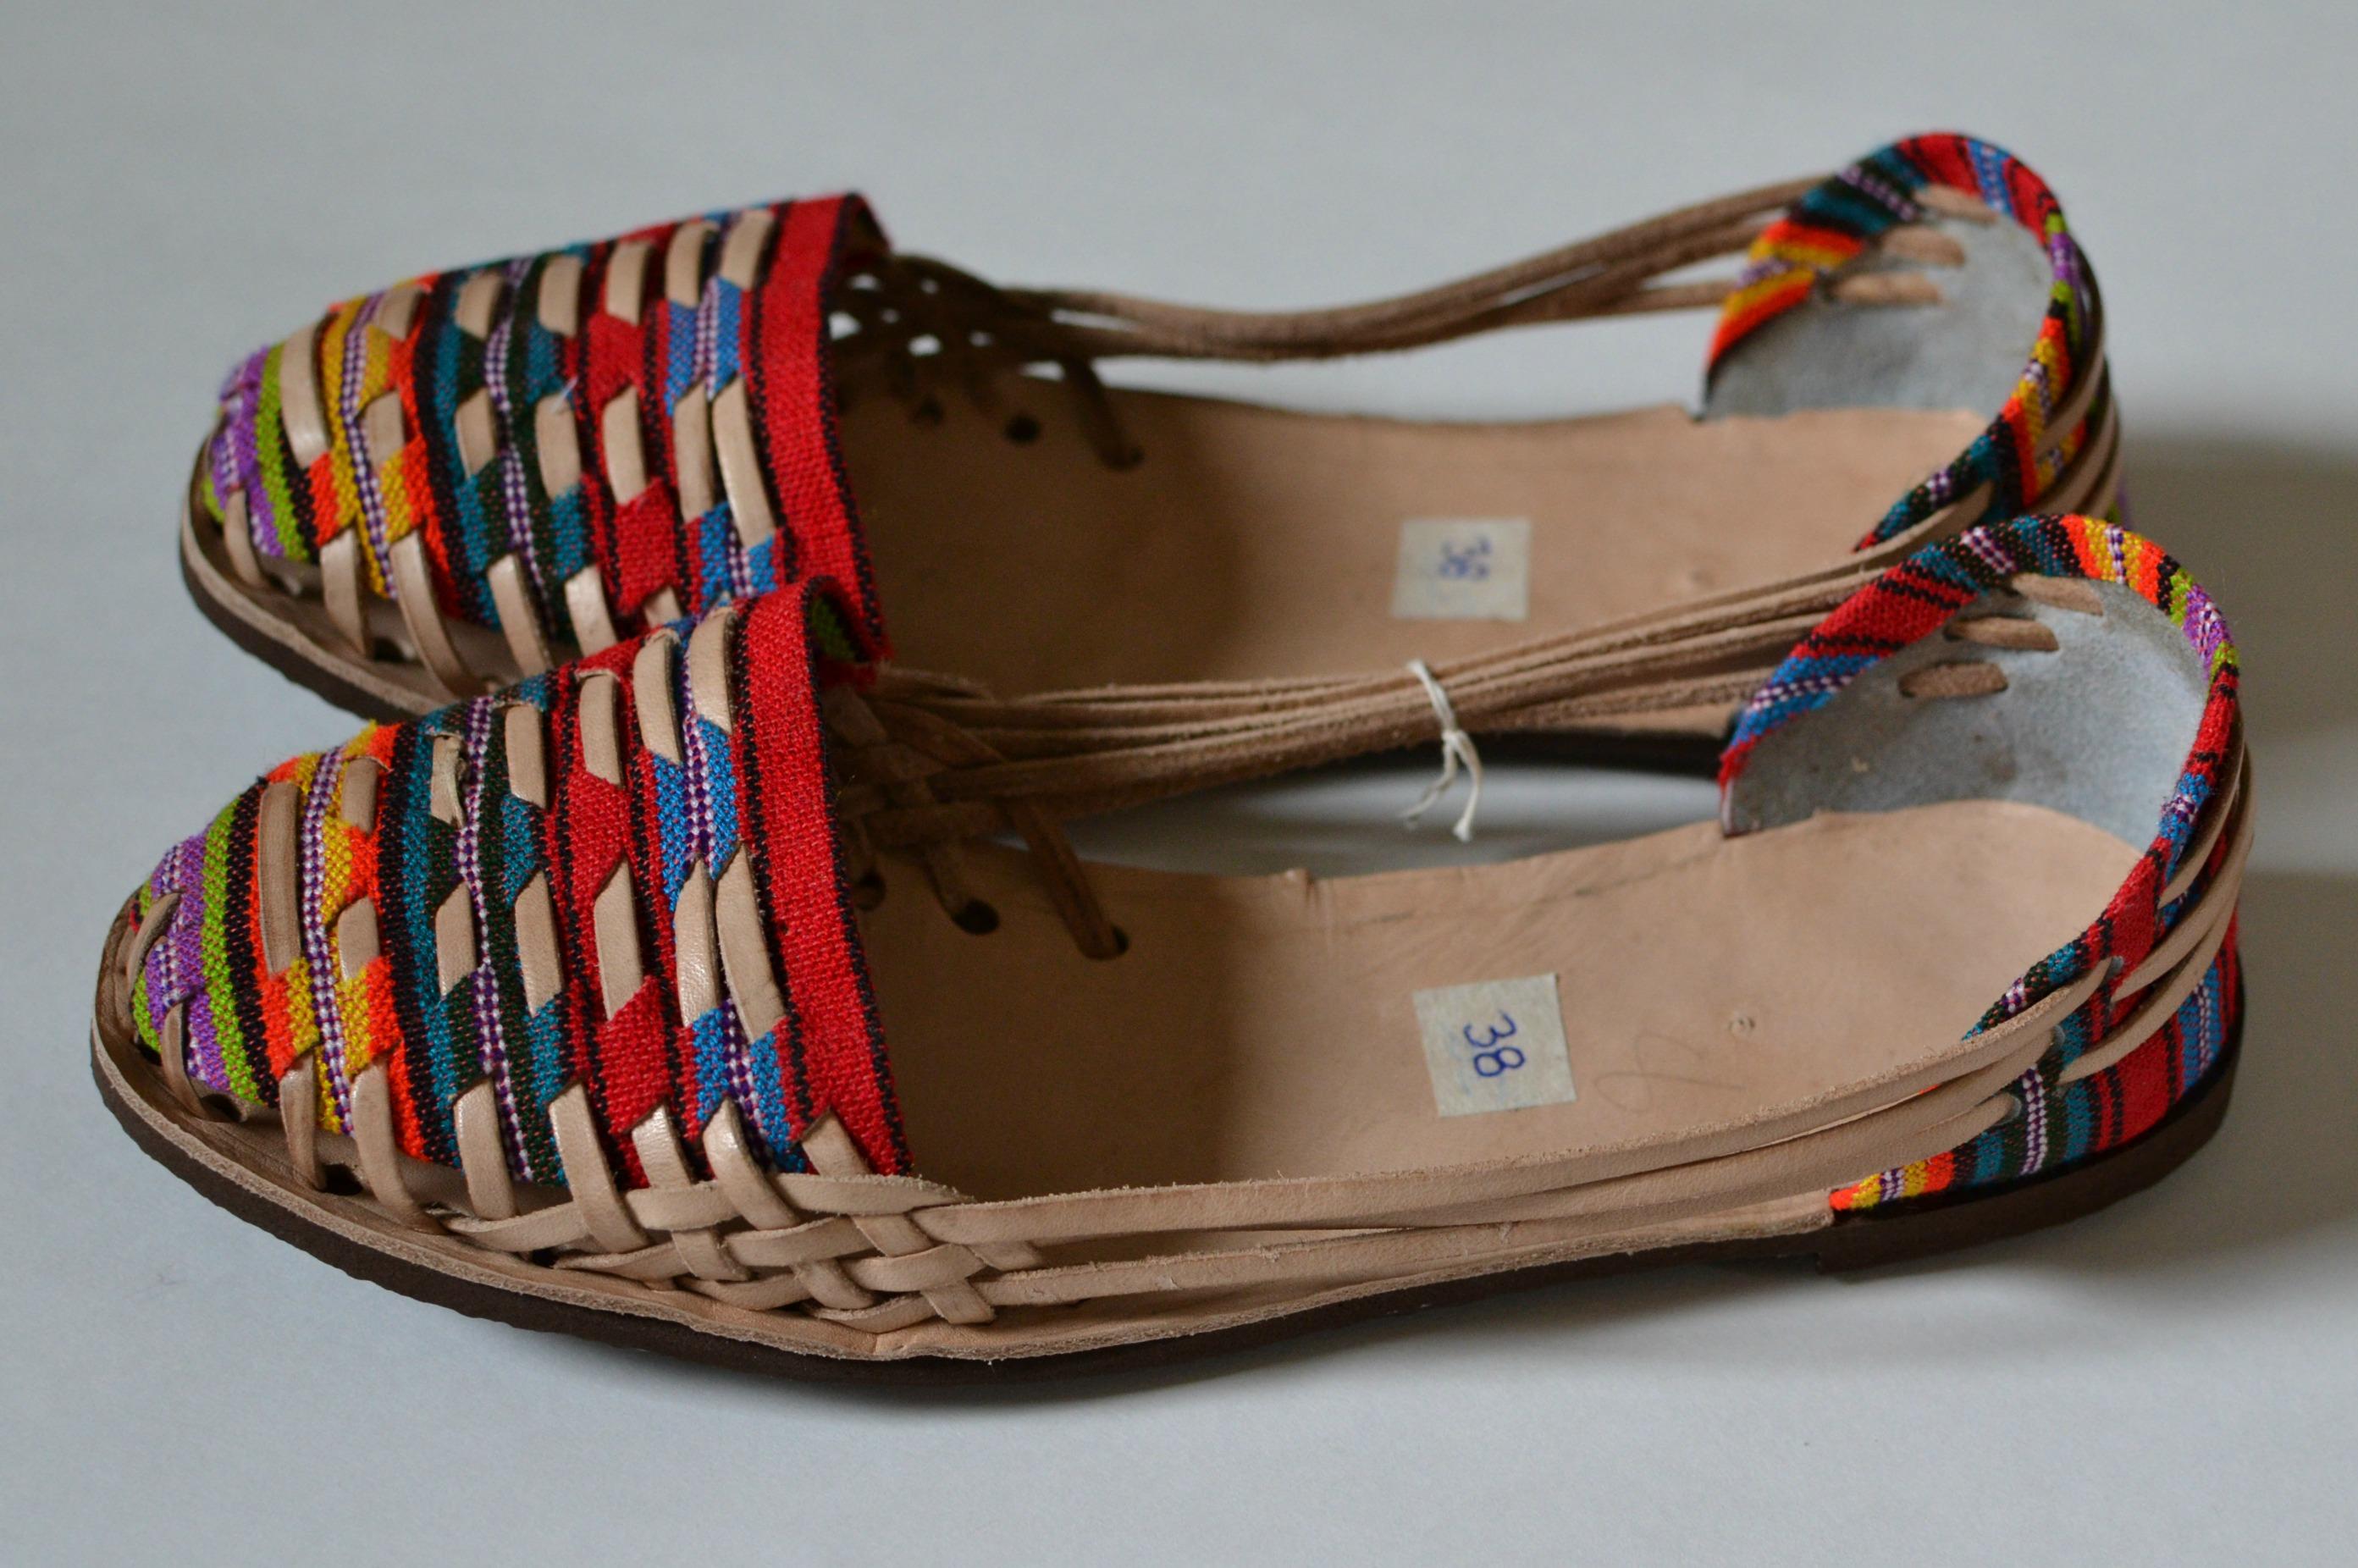 520073a1e21f Women s Caites Huaraches Size 38 US 7.5 · Life s Little Thrills ...